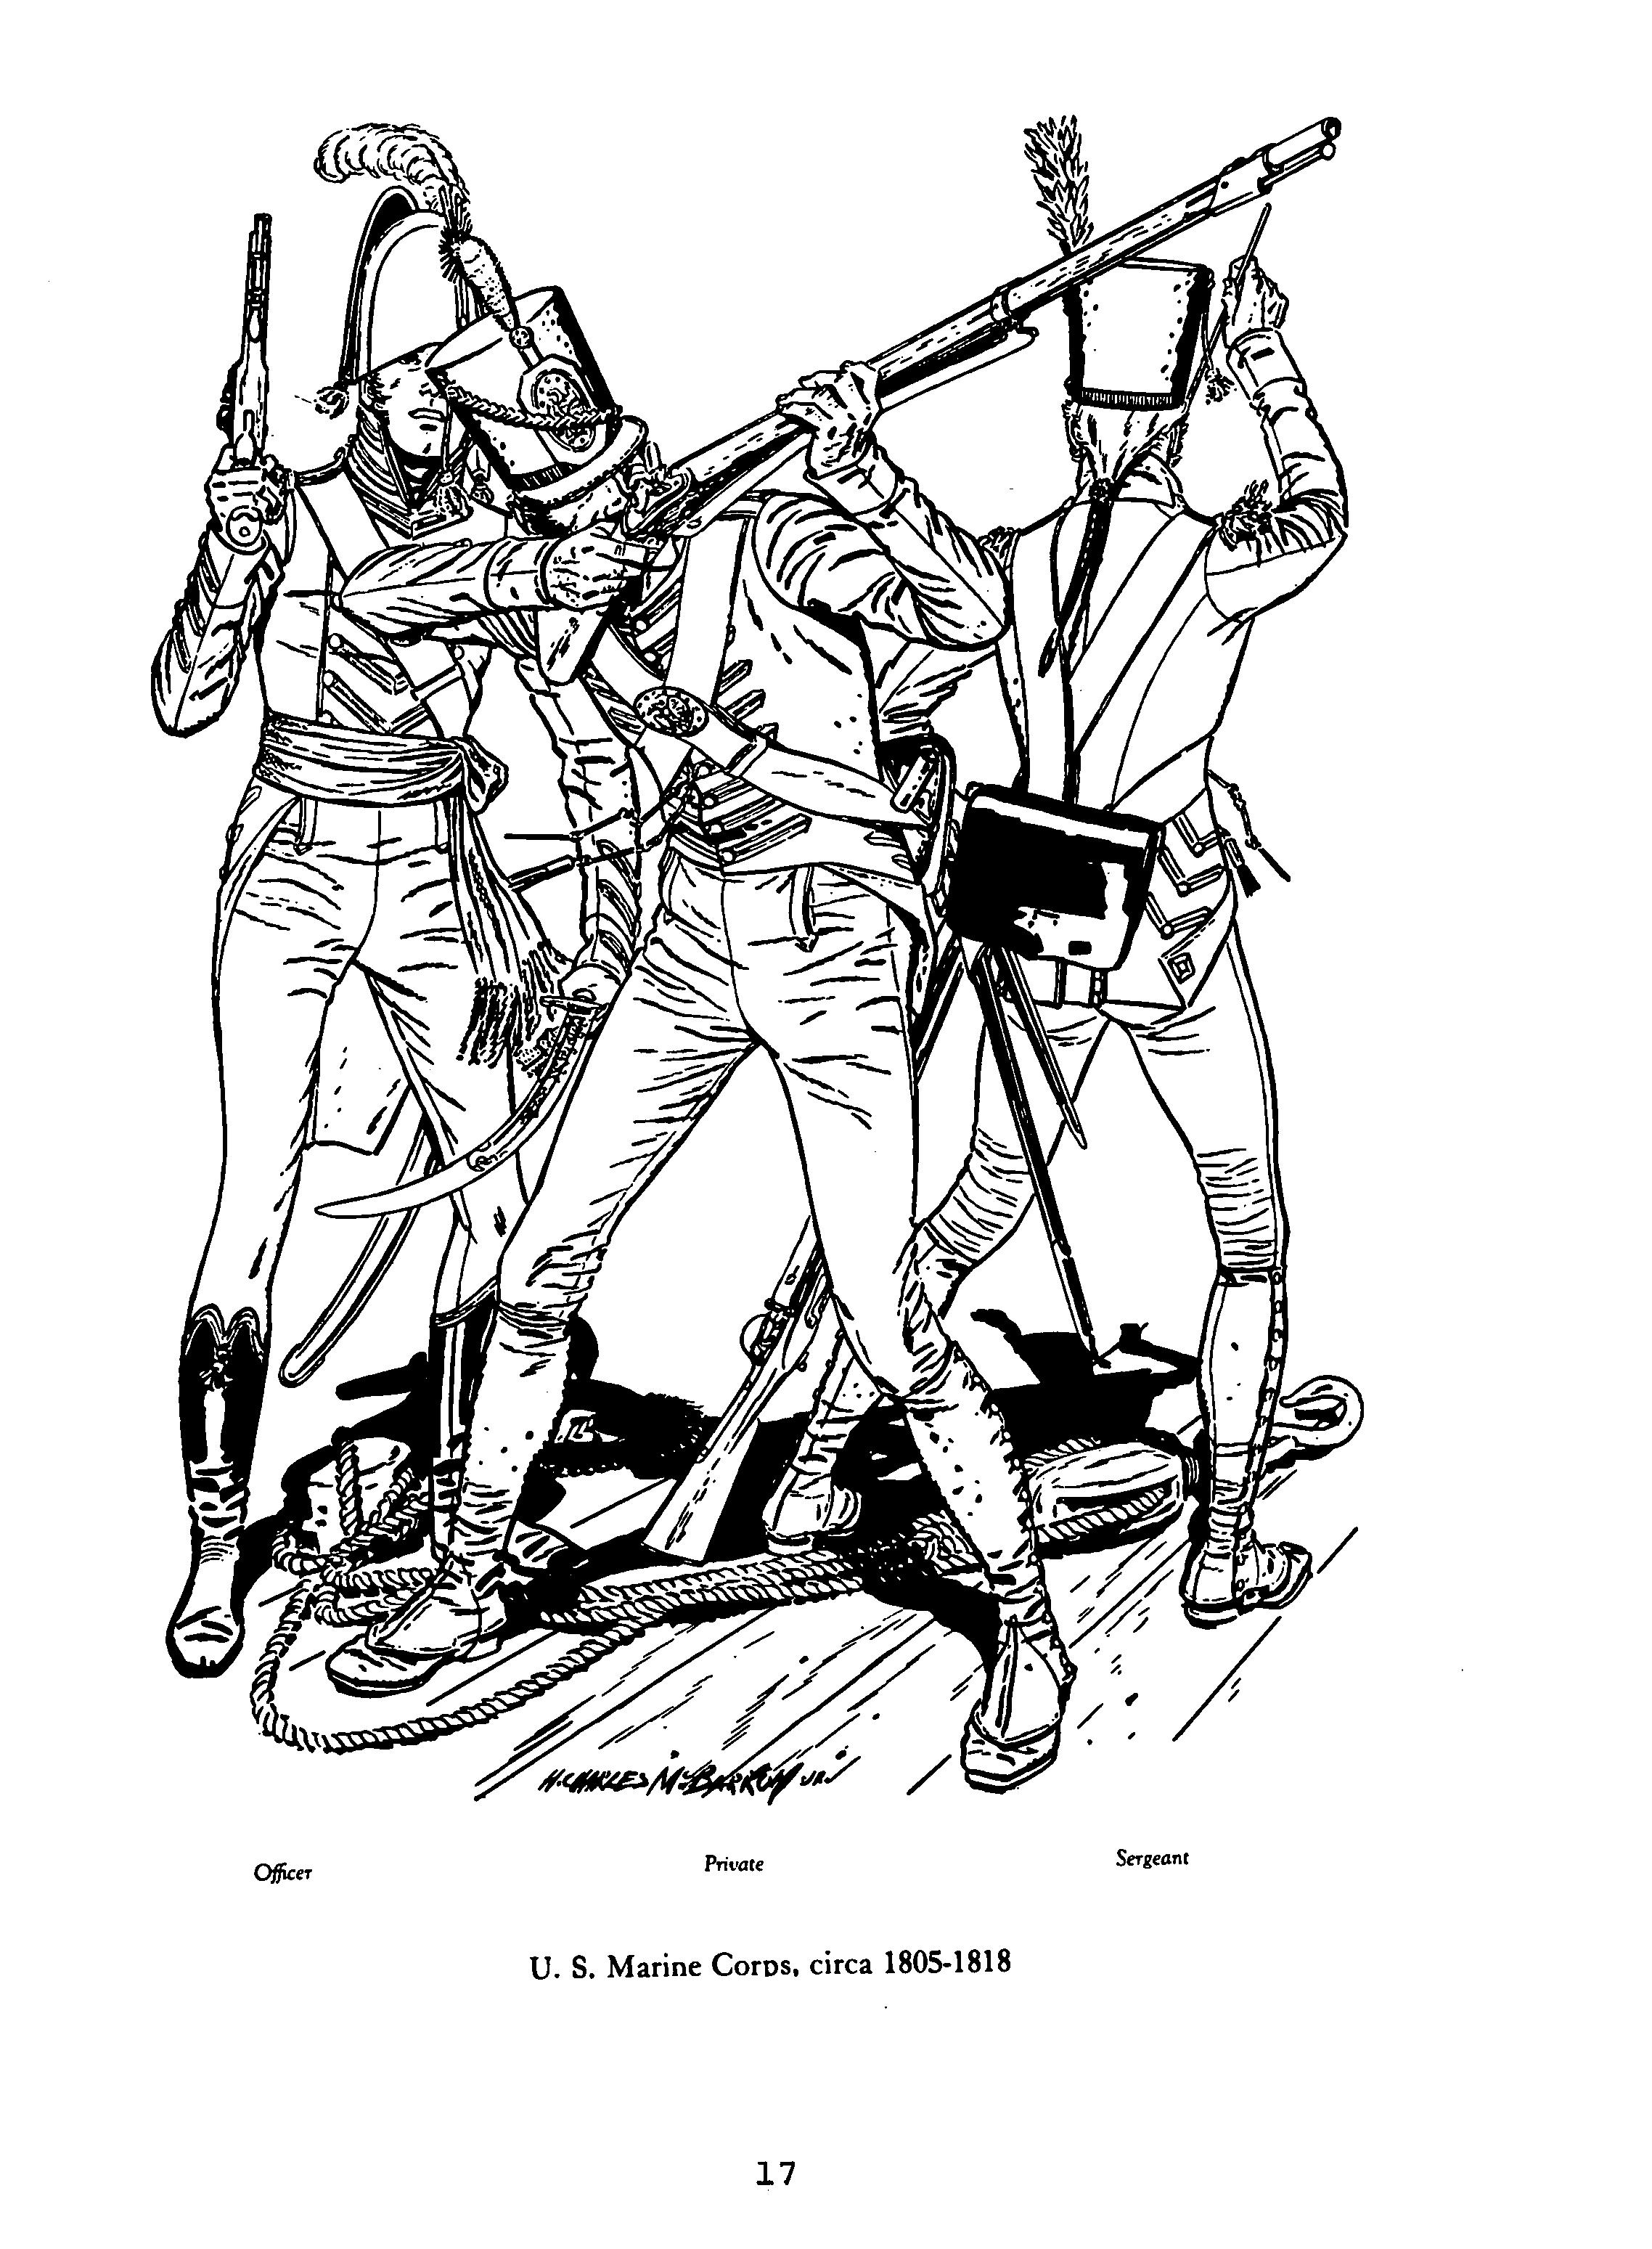 US Marines Corps, War of 1812, by H Charles McBarron